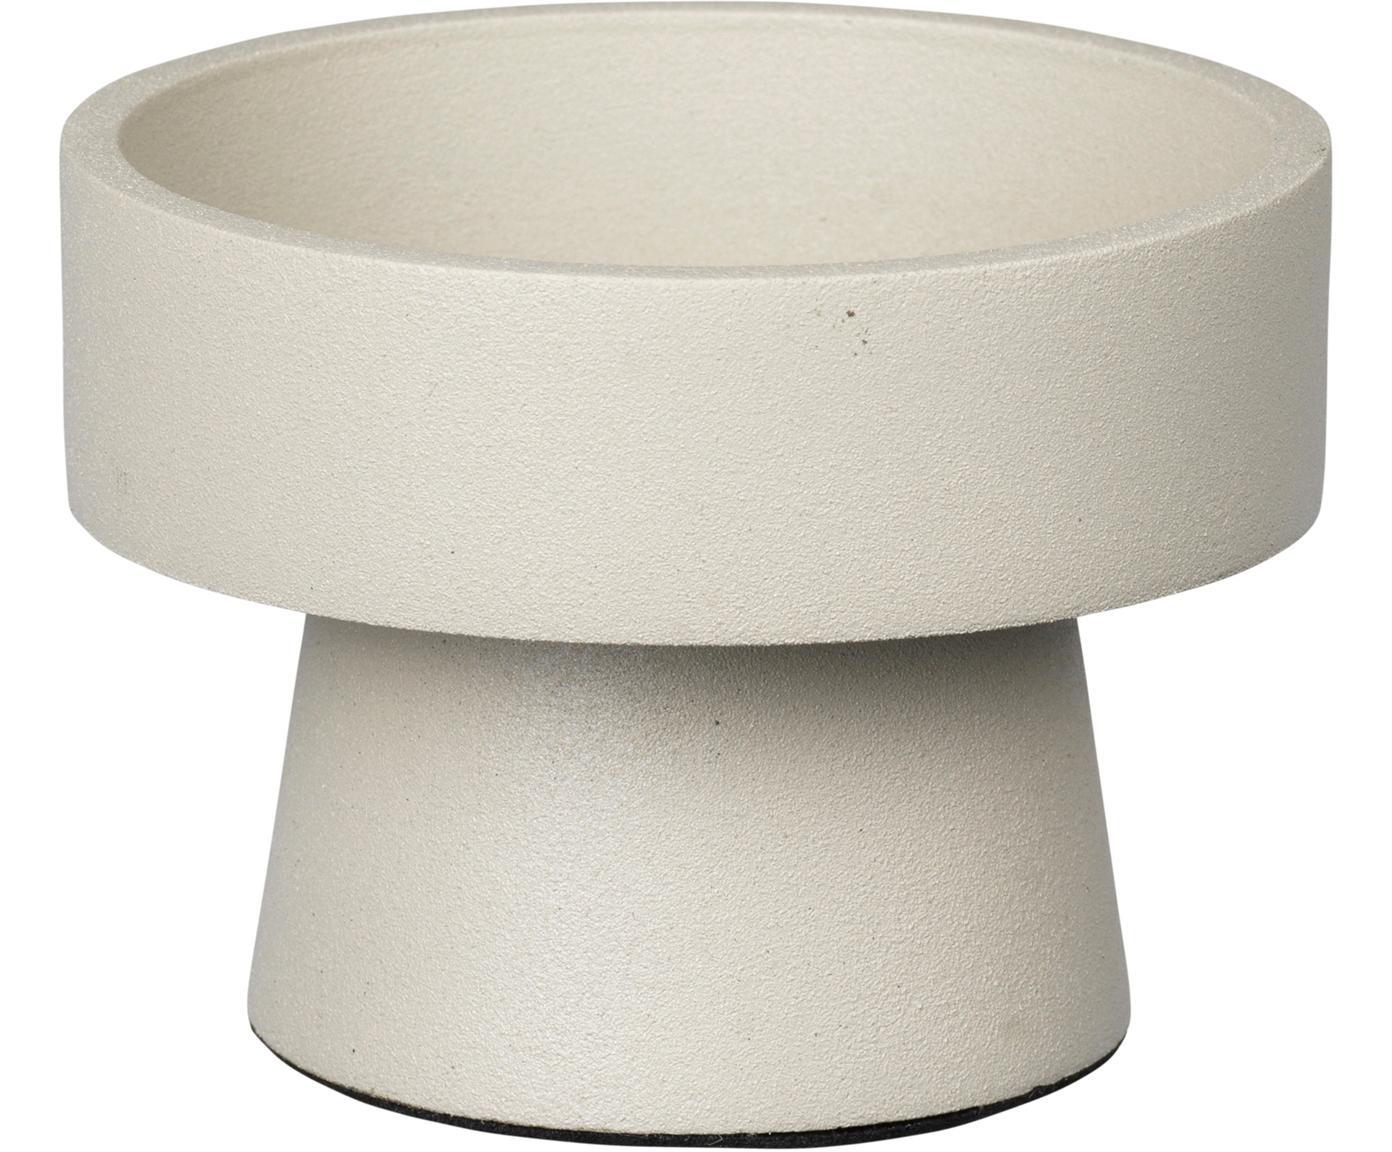 Kandelaar Anker, Gecoat aluminium, Beige, Ø 8 x H 6 cm